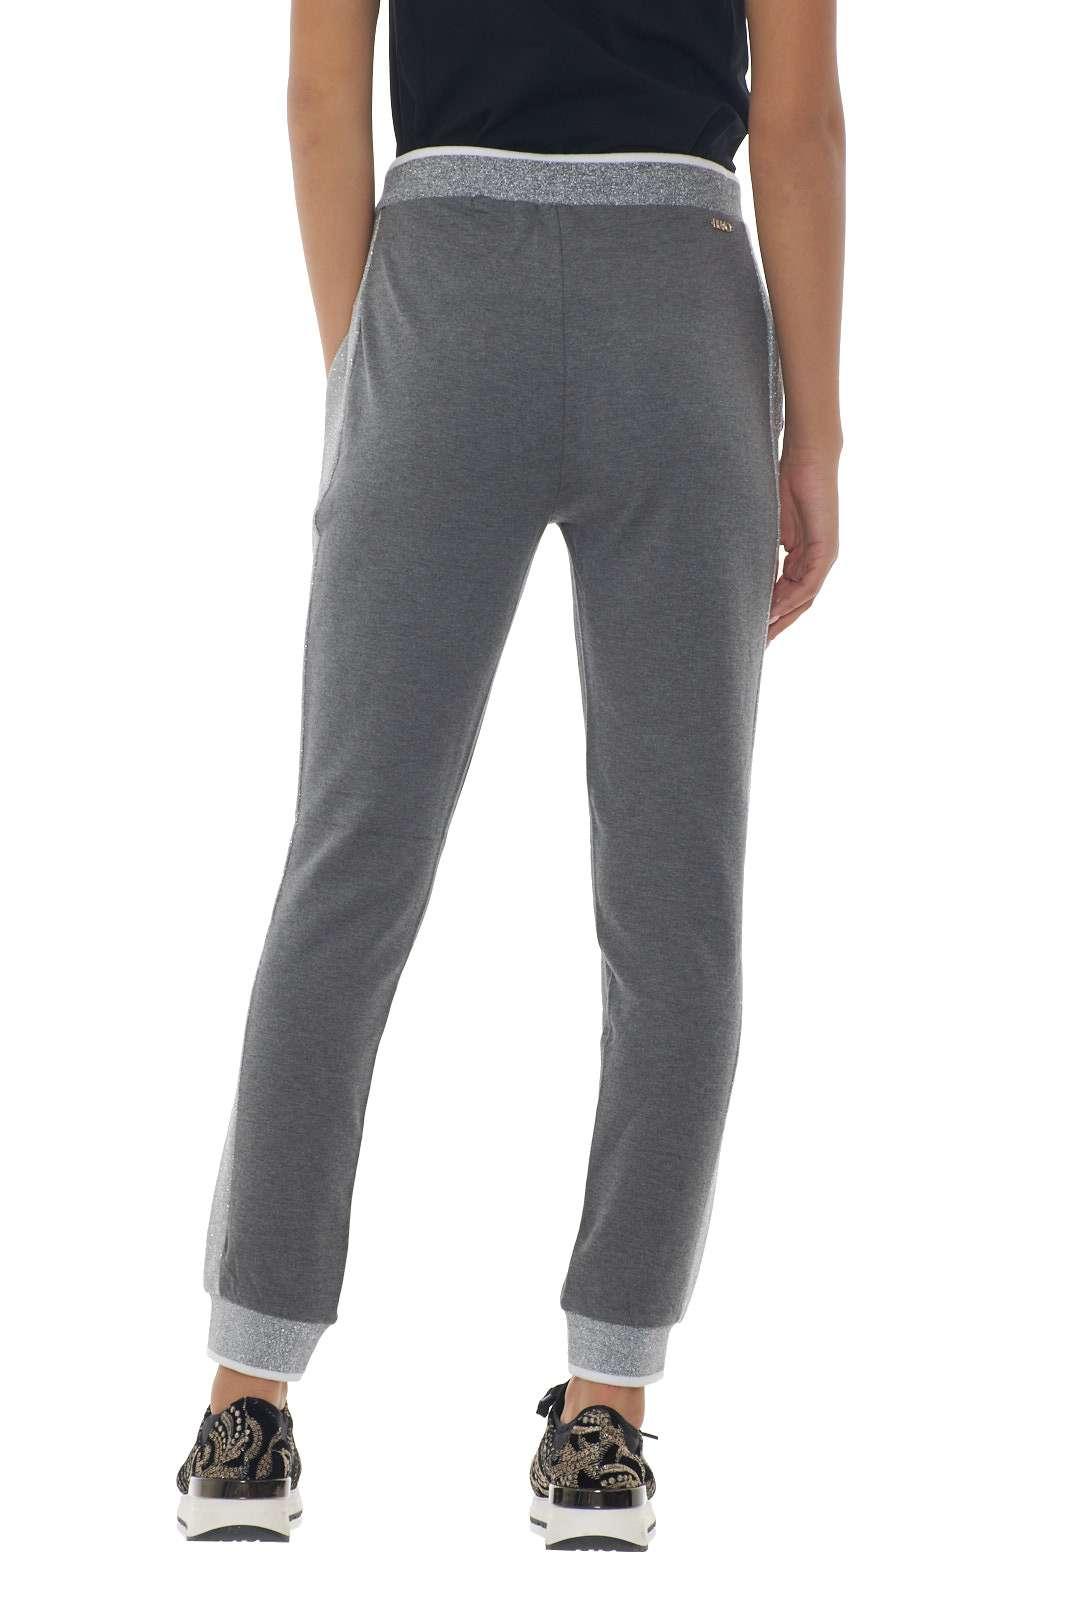 https://www.parmax.com/media/catalog/product/a/i/AI-outlet_parmax-pantaloni-donna-Liu-Jo-T69045-C.jpg